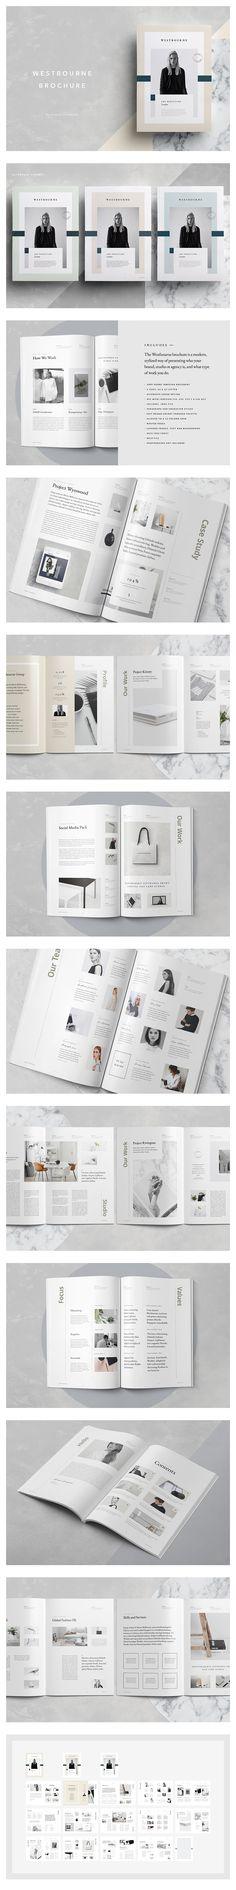 The Professional Designer's Time-Saving Toolkit « Design Cuts